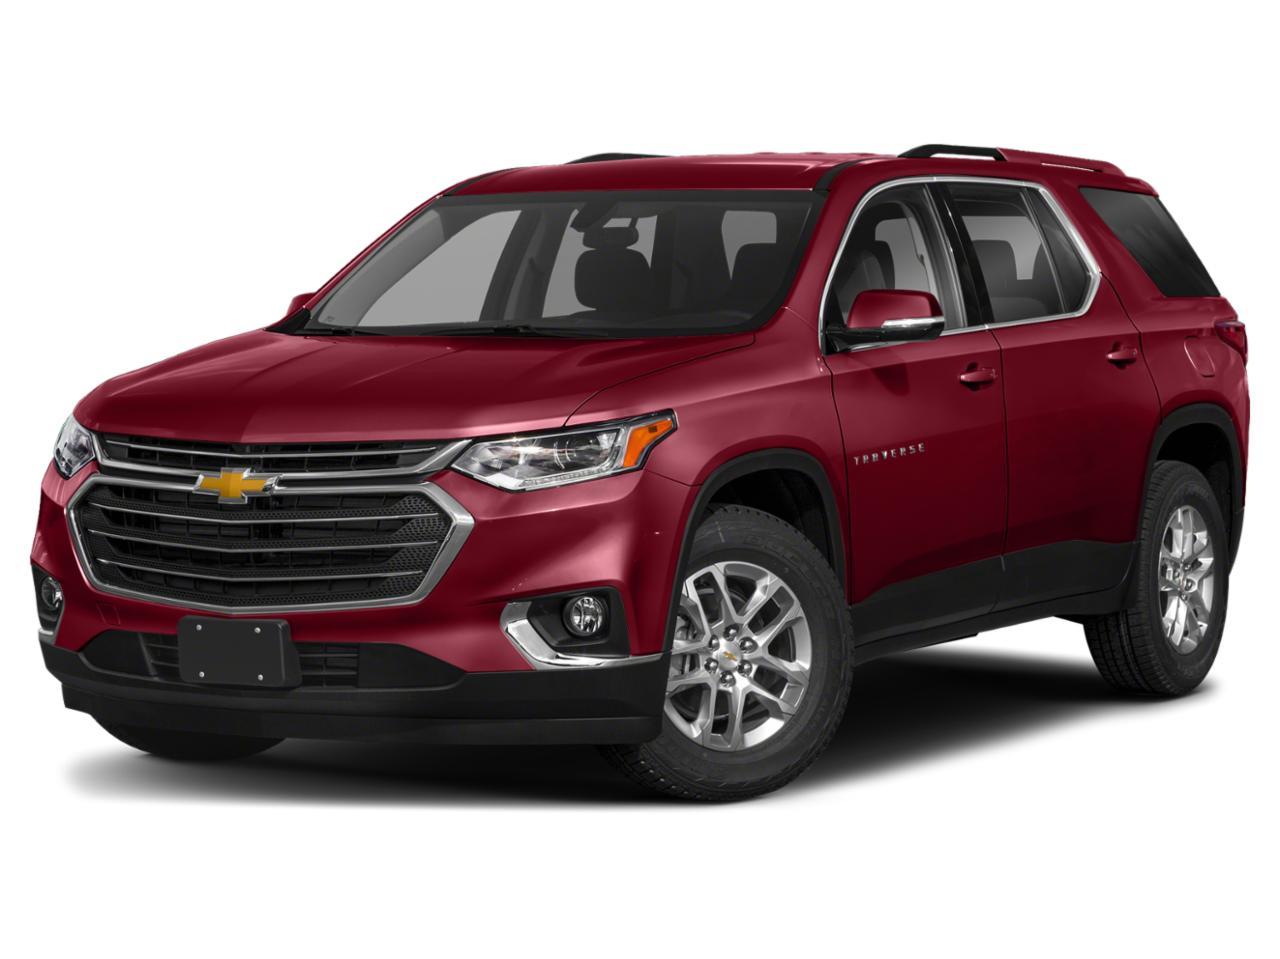 2018 Chevrolet Traverse Vehicle Photo in Oshkosh, WI 54904